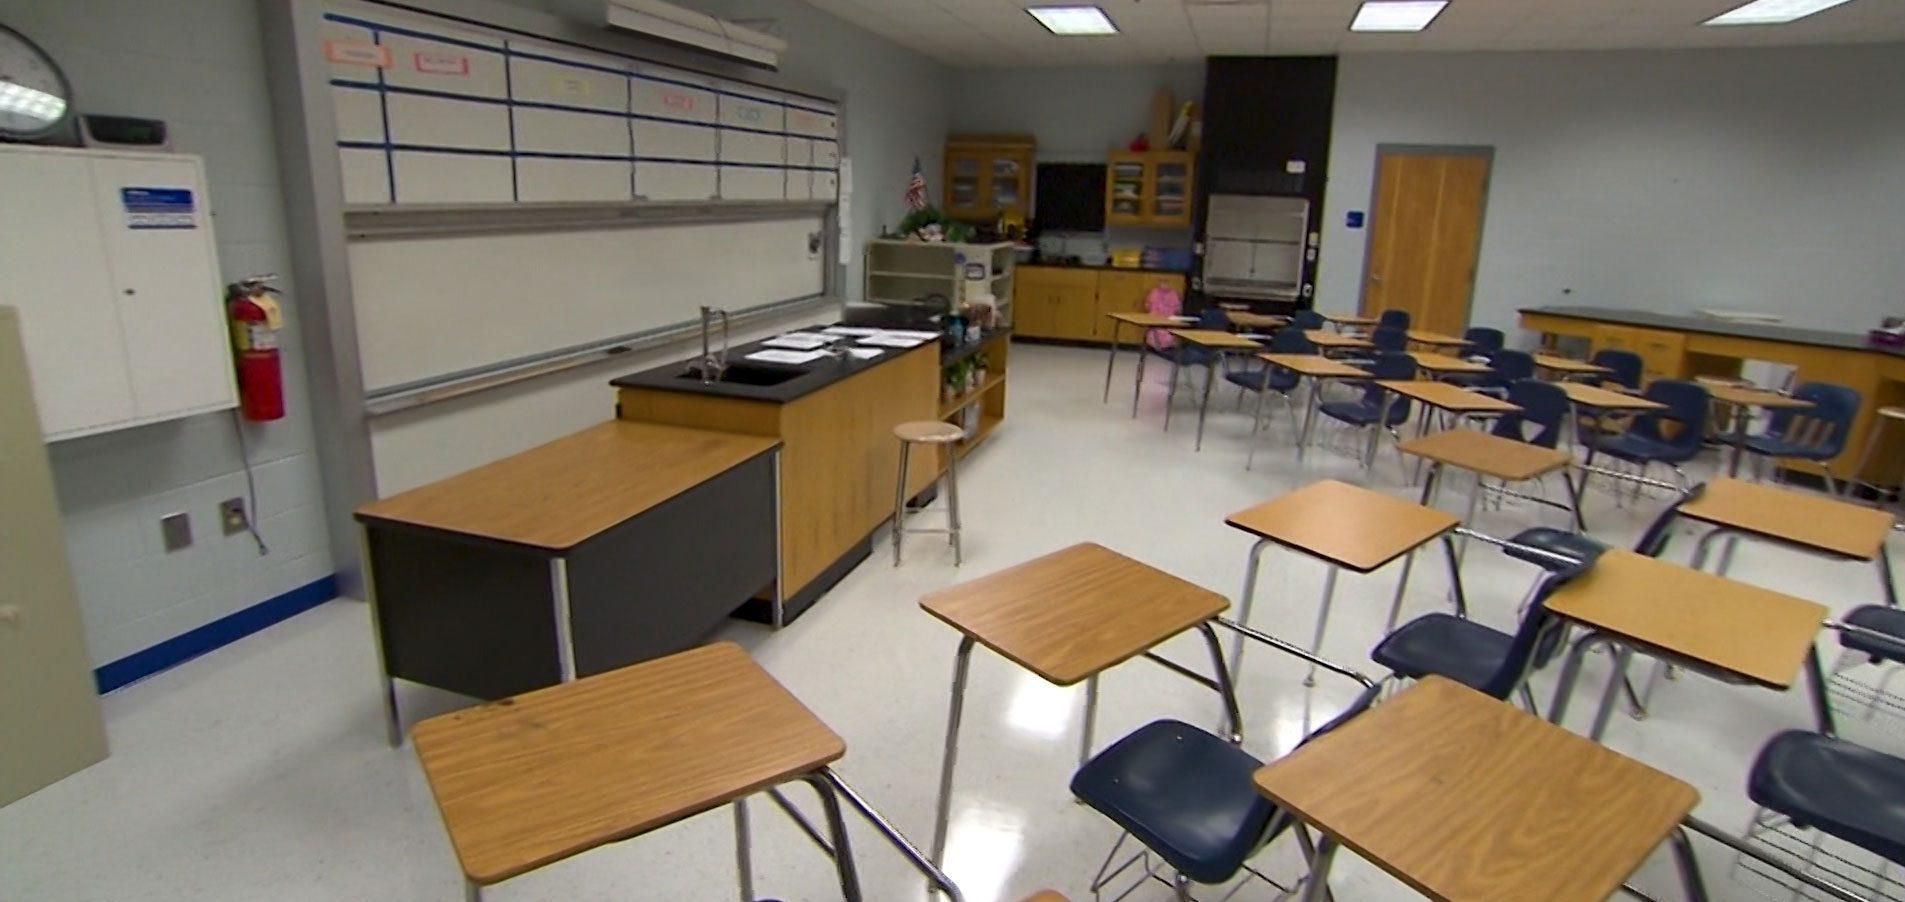 School Board Members Deserve Respect, Not Threats